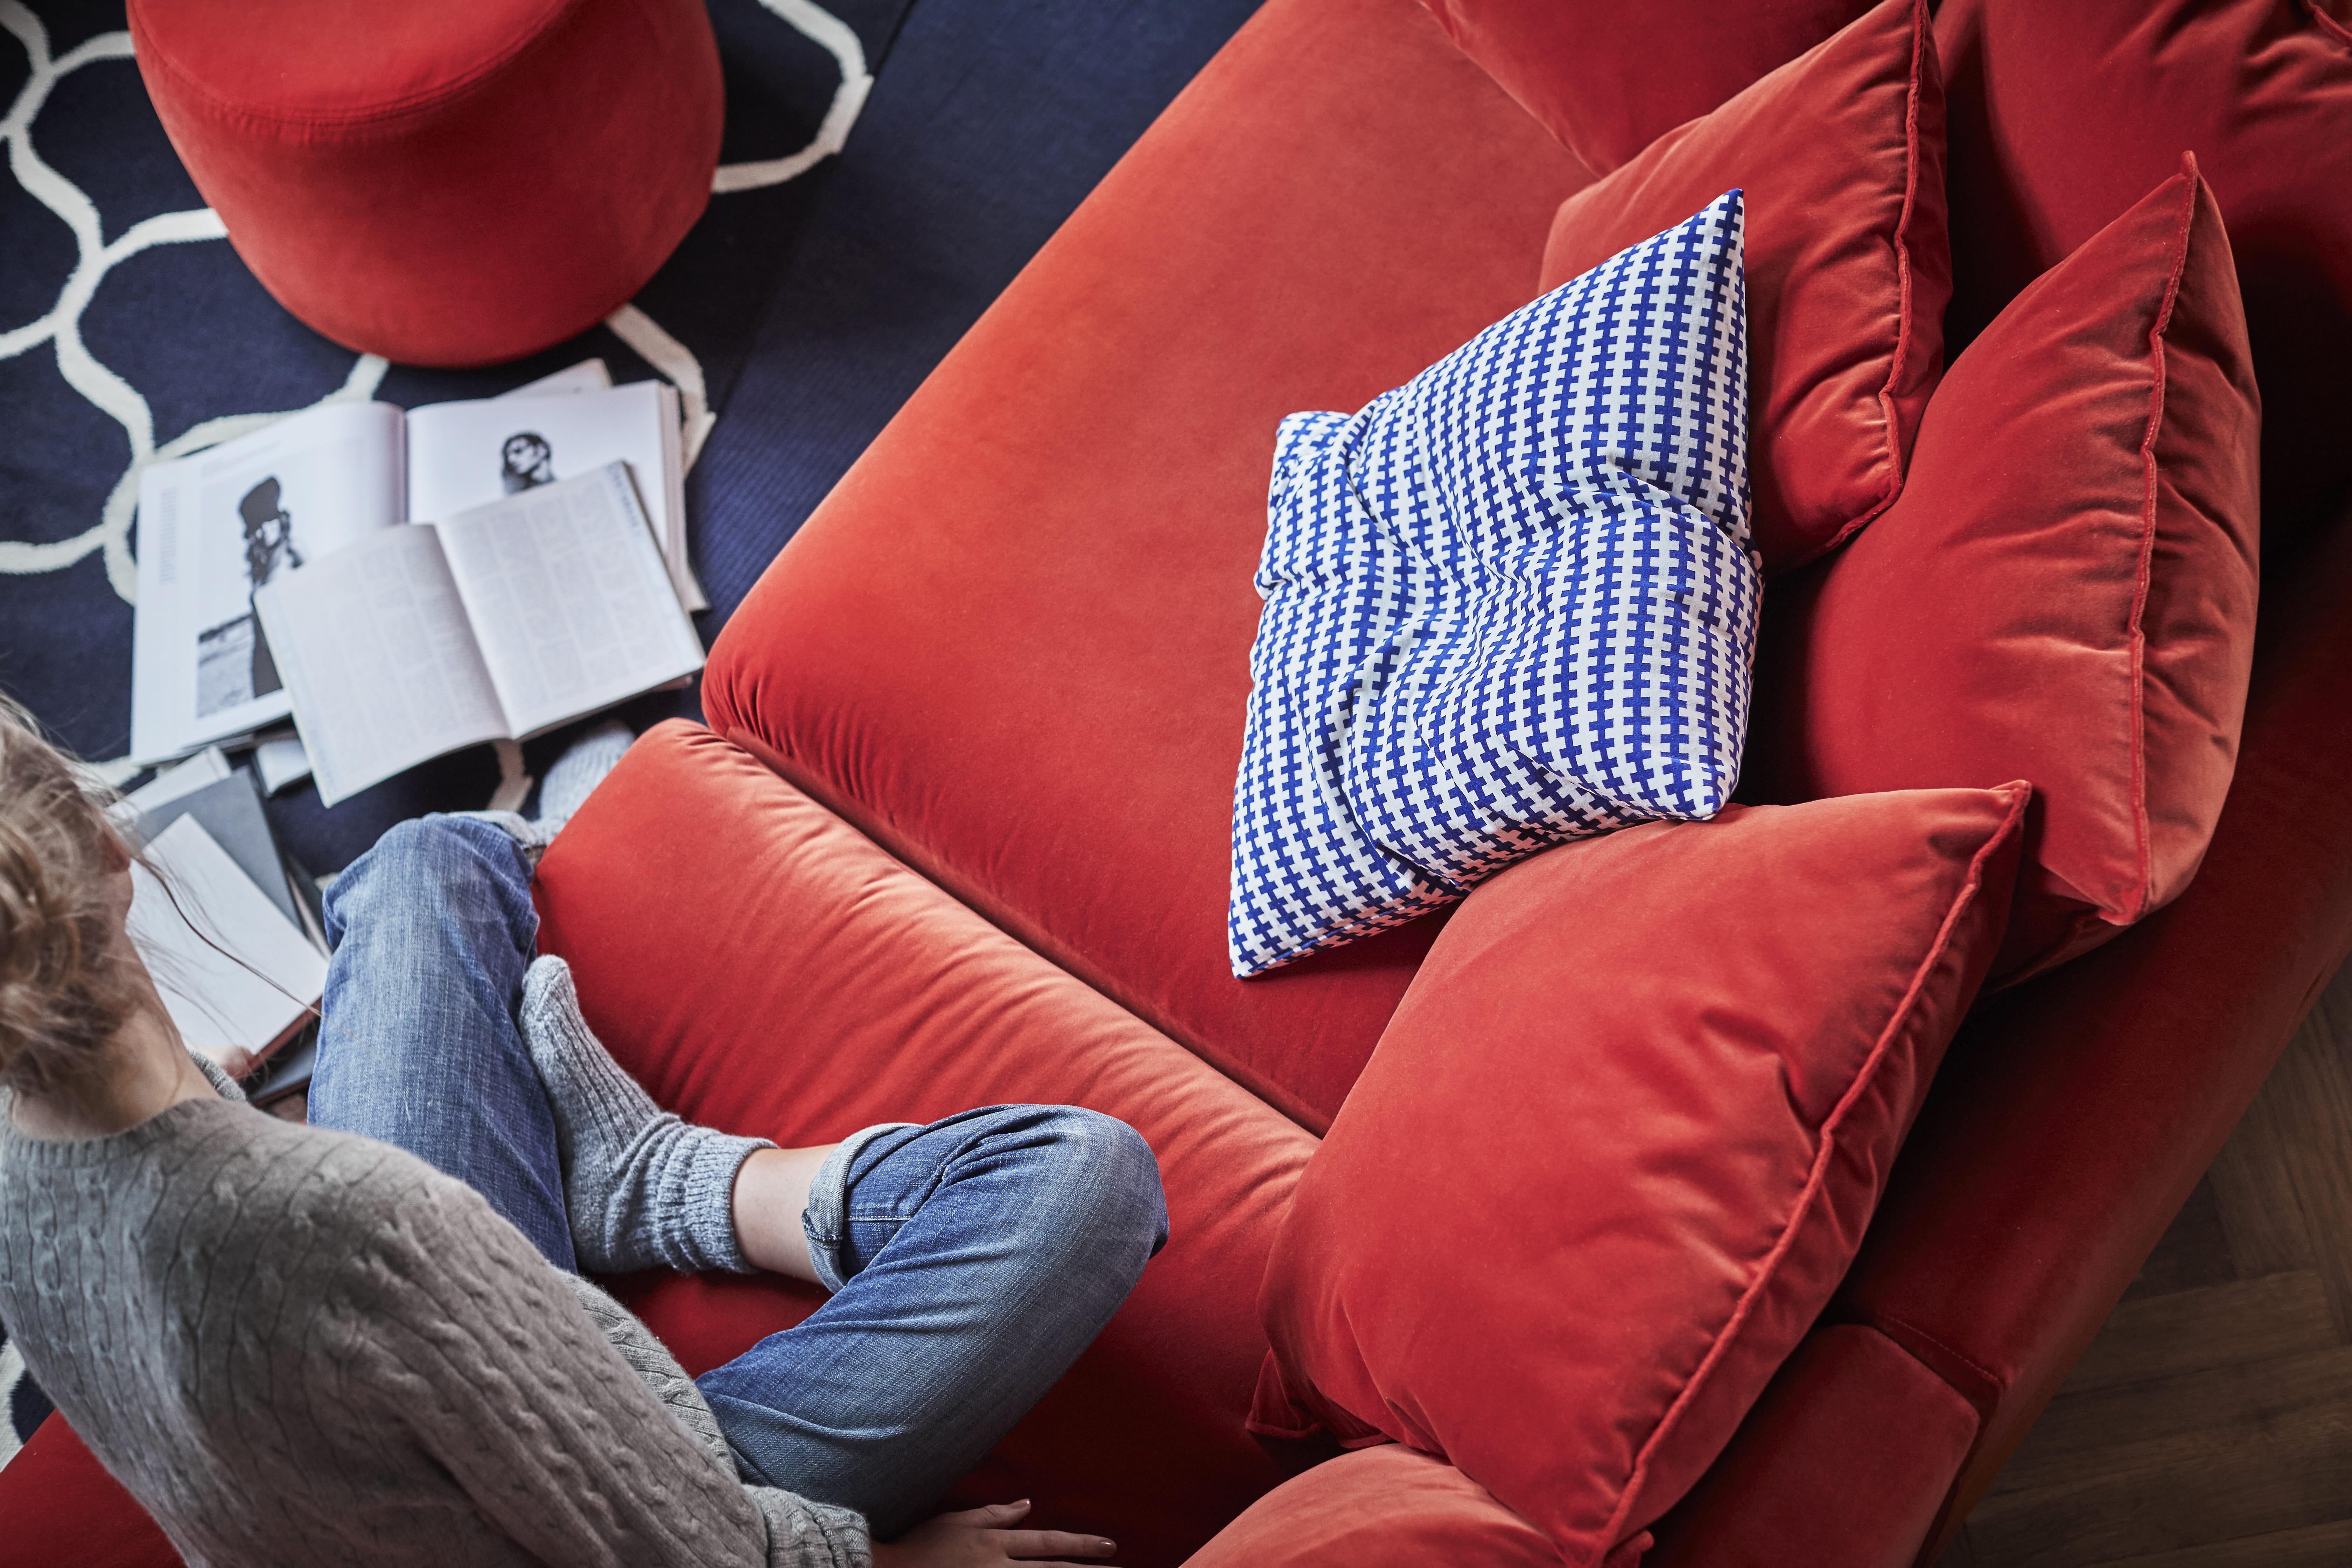 Conversation with Laurent Tiersen, Country Marketing Manager, IKEA UK & Ireland